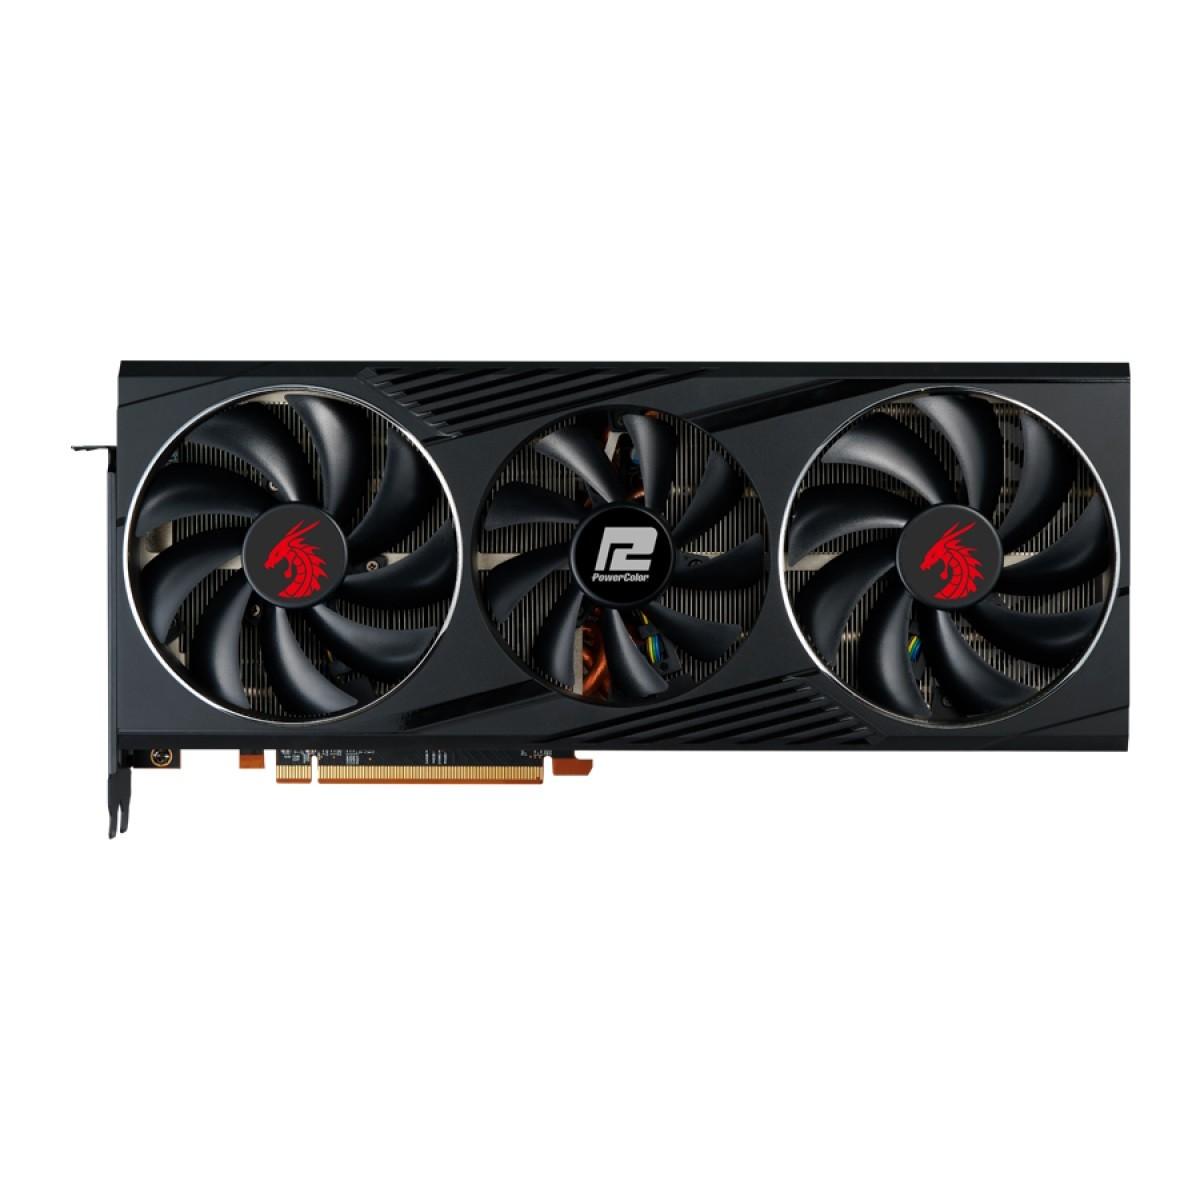 Kit Upgrade PowerColor Radeon RX 6800 Red Dragon + AMD Ryzen 9 5900X + Brinde Jogo Dirt 5